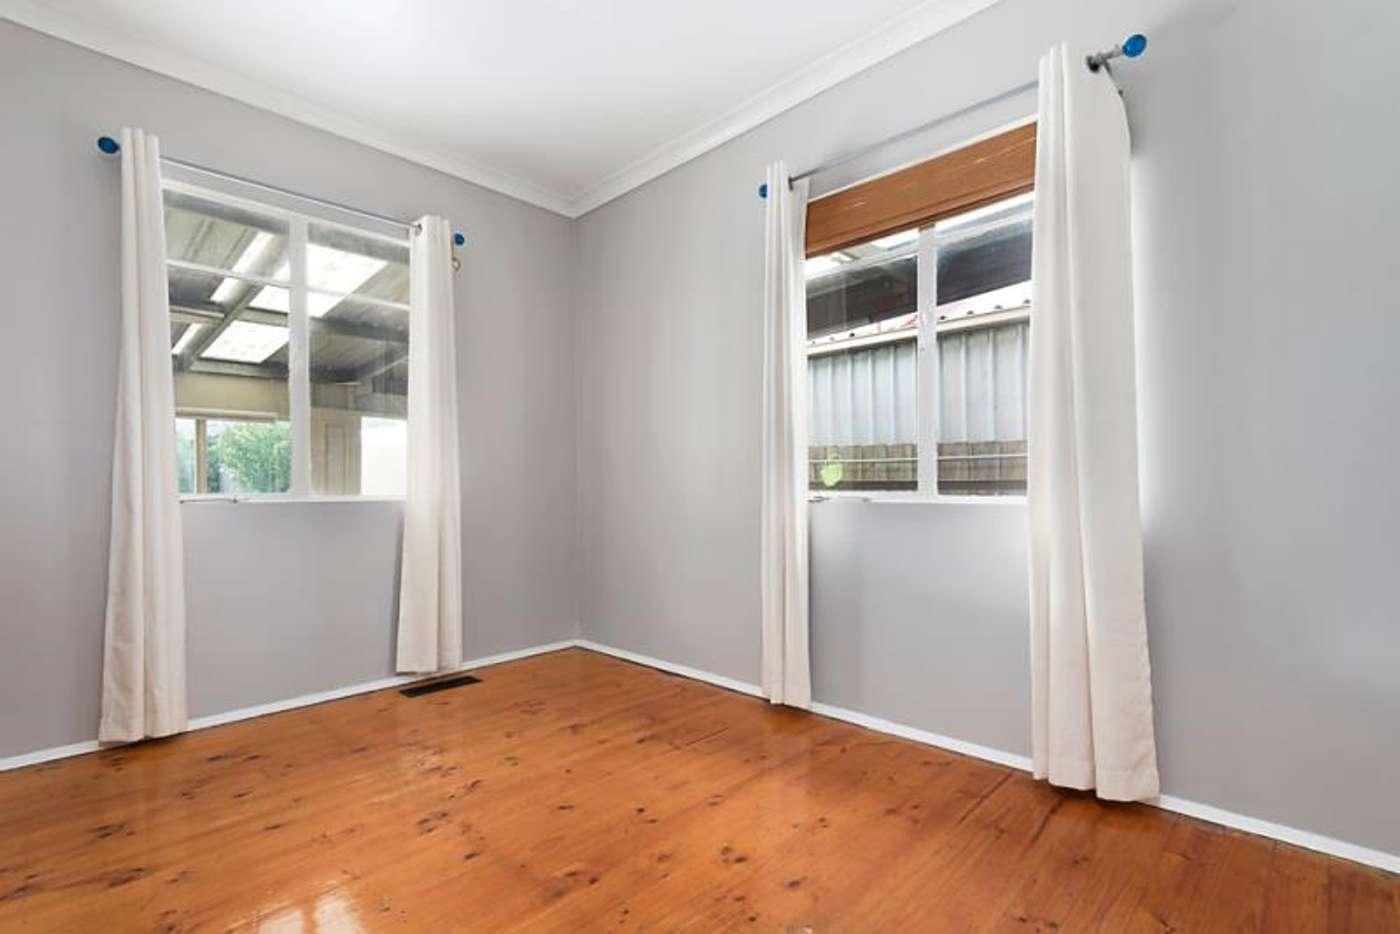 Sixth view of Homely house listing, 4 Cynga Street, Preston VIC 3072